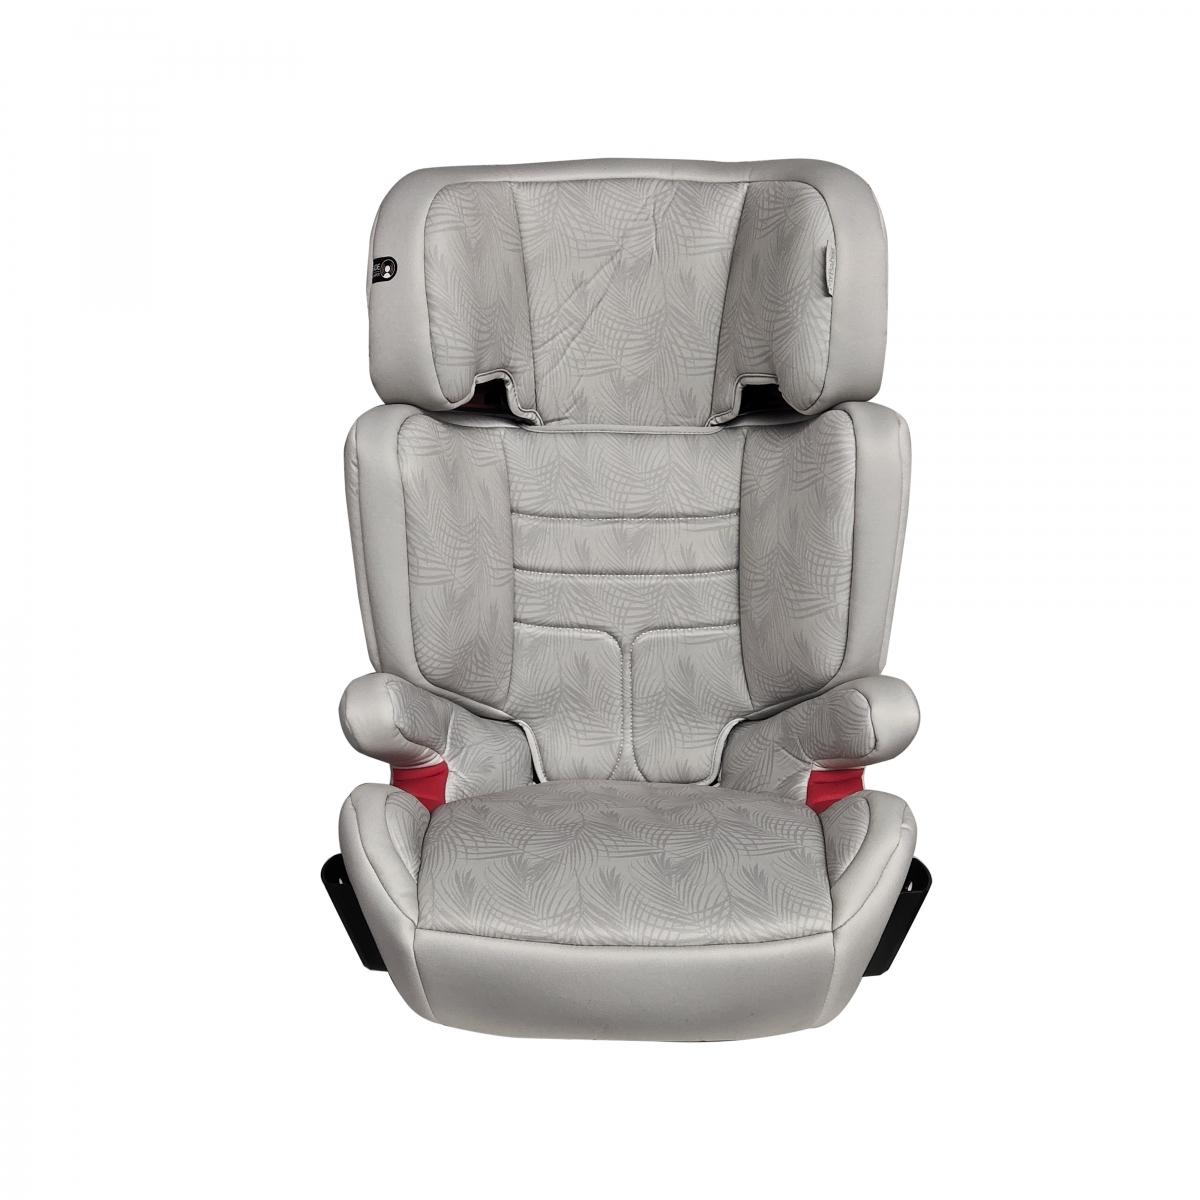 My Babiie Dreamiie Group 2/3 Car Seat-Grey Tropical (MBCS23SFGT)